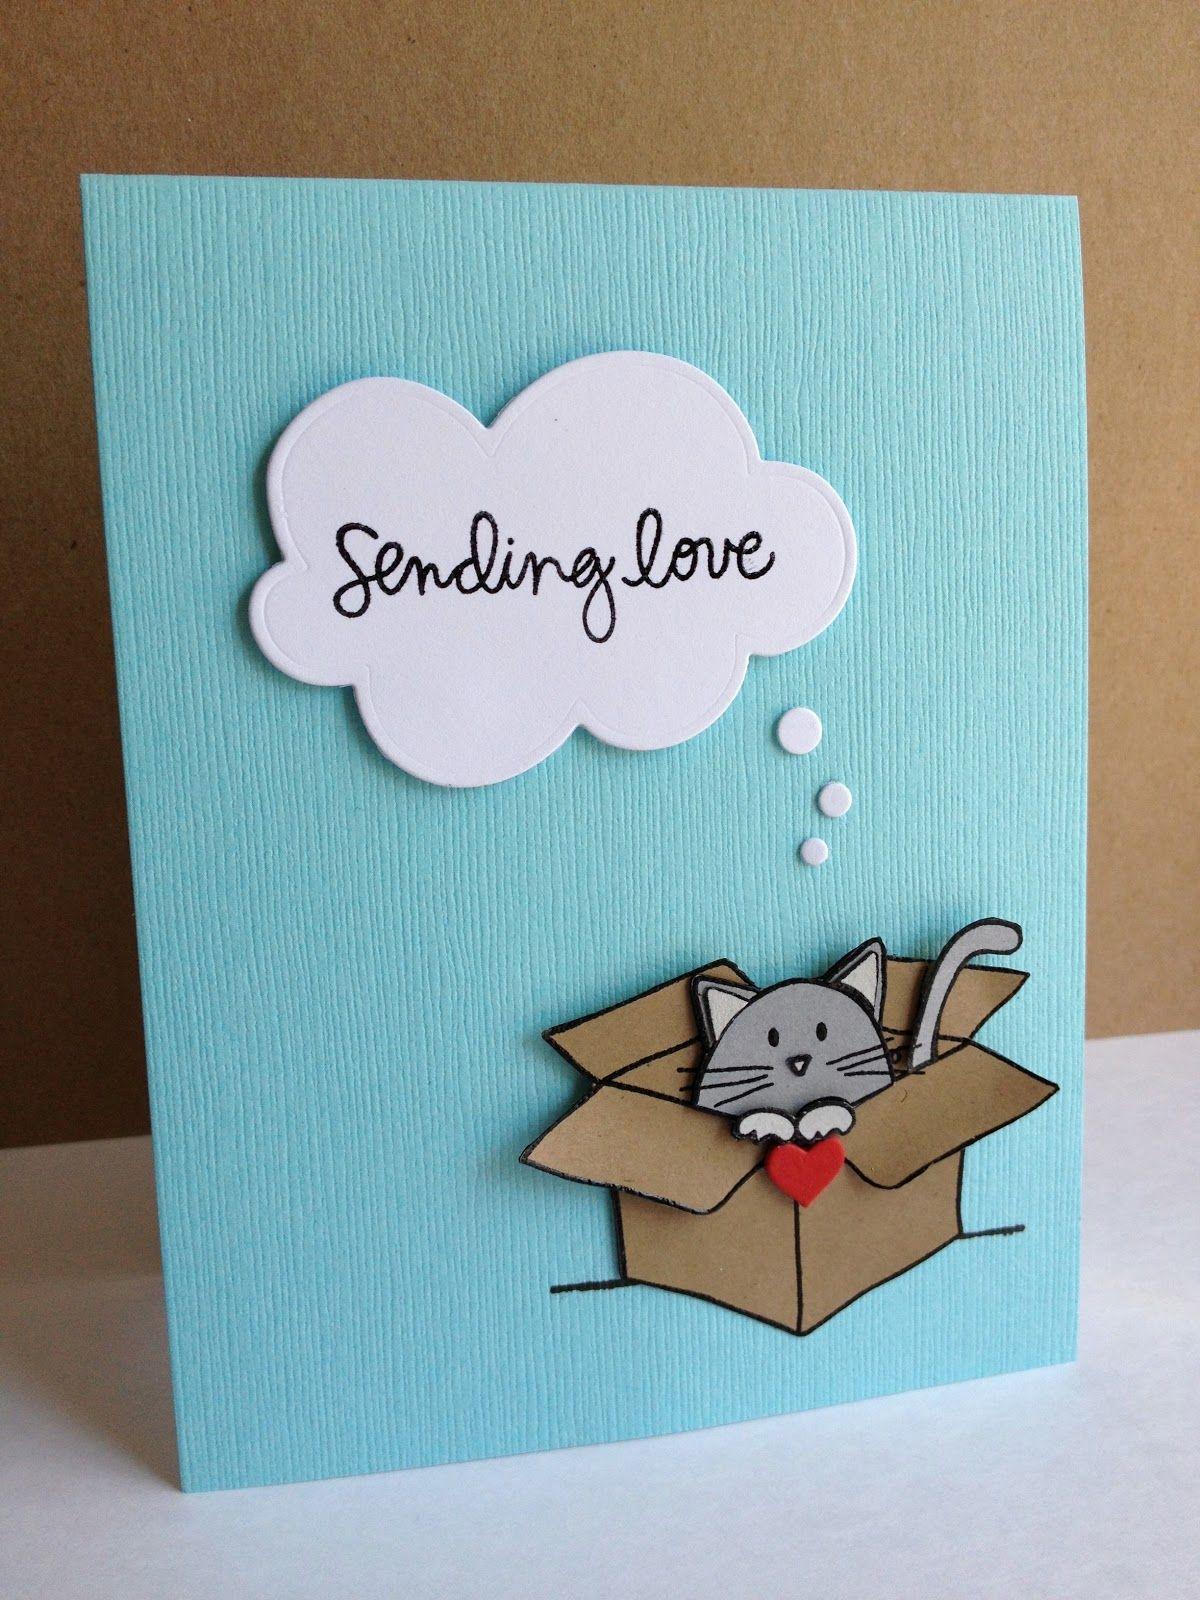 I M In Haven Sending Love So Cute Birthday Cards Diy Cards Handmade Handmade Birthday Cards